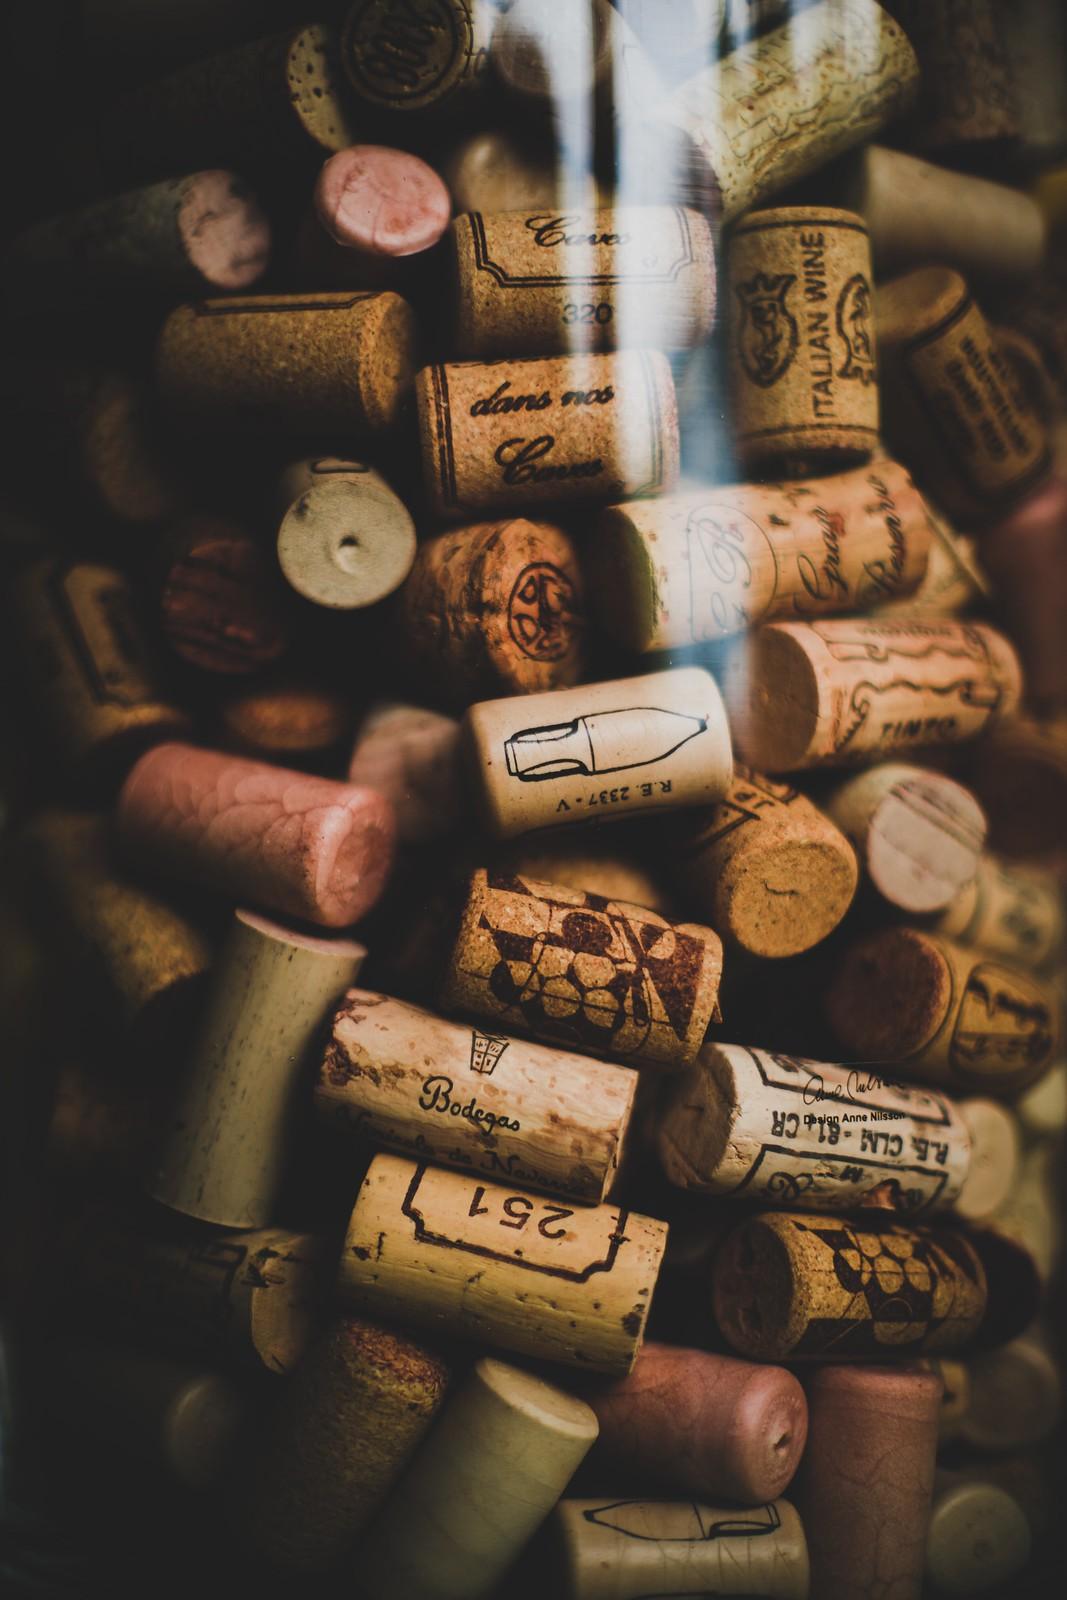 Ranska viini